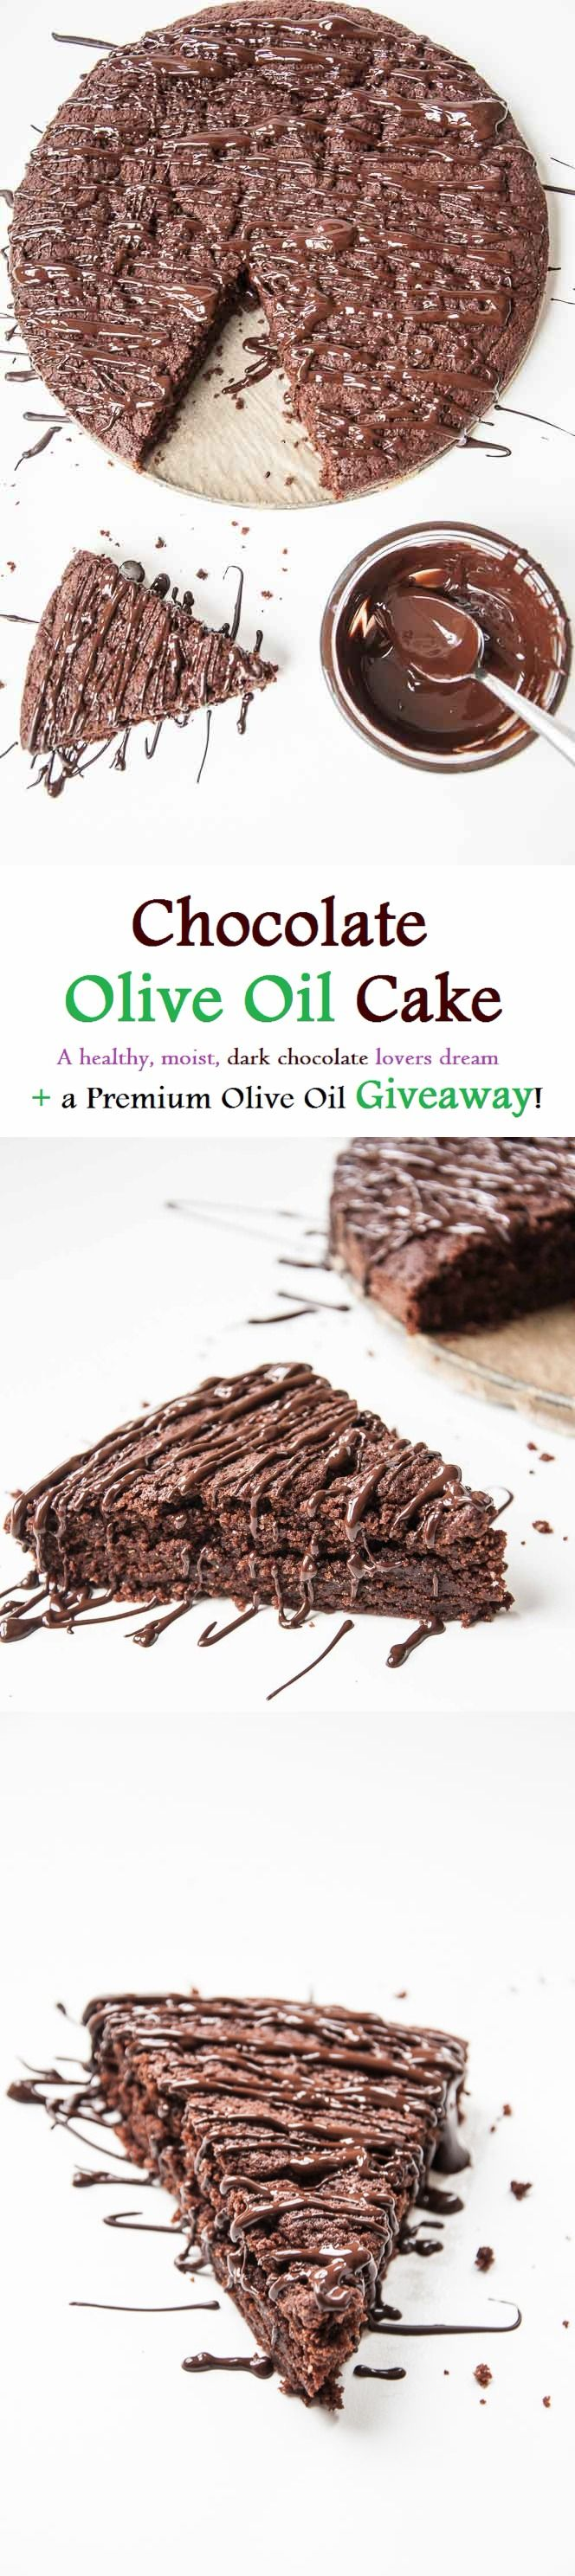 Moist Chocolate Olive Oil Cake Recipe   VeganFamilyRecipes.com   #clean eating #dessert #dark chocolate #vegan